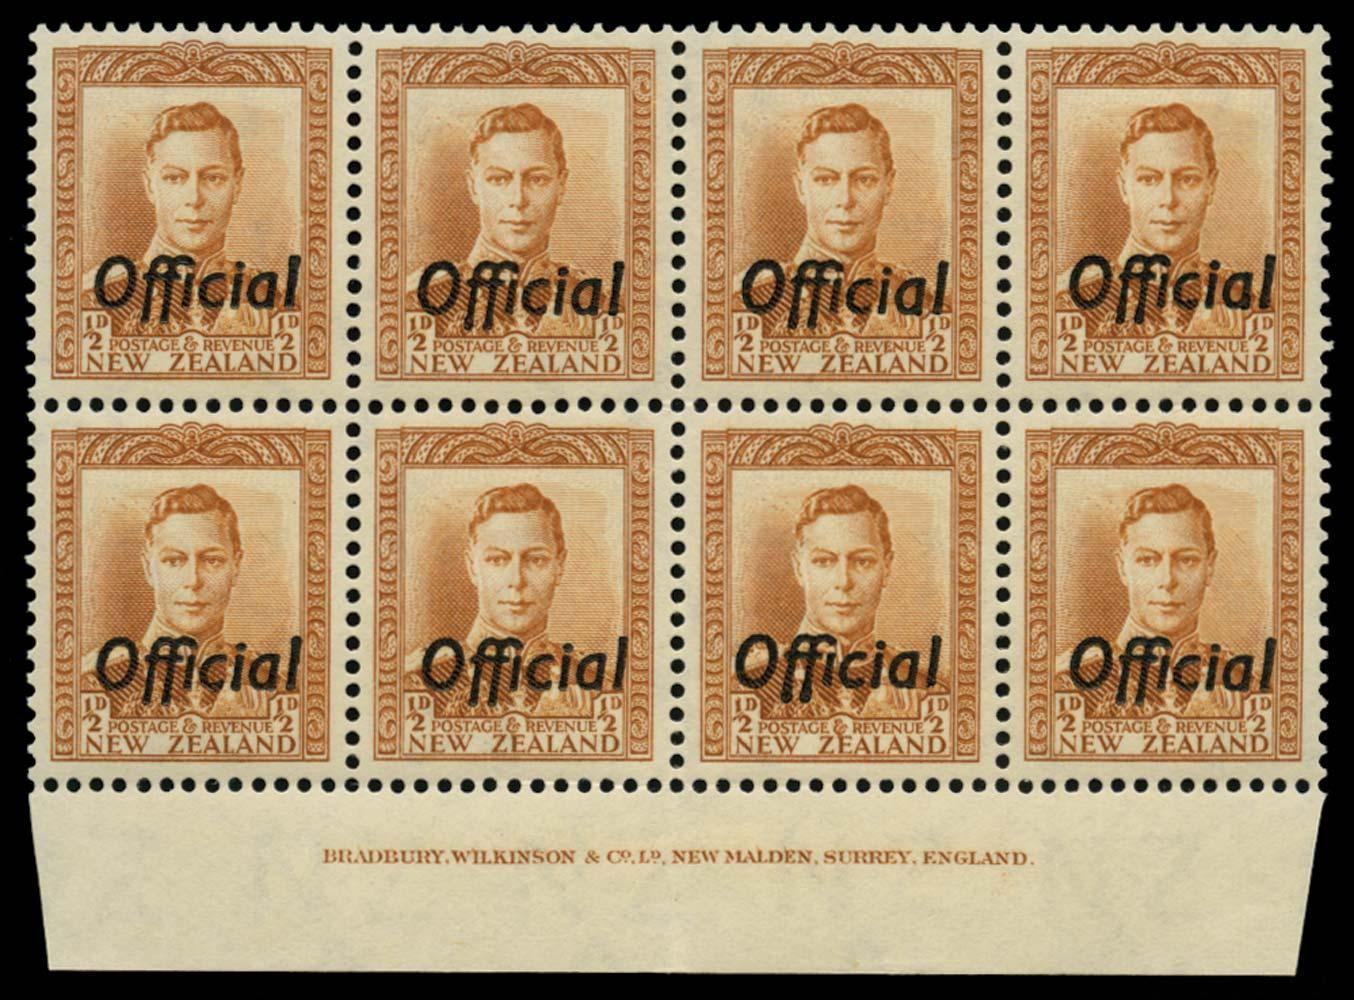 NEW ZEALAND 1938  SGO135 Official